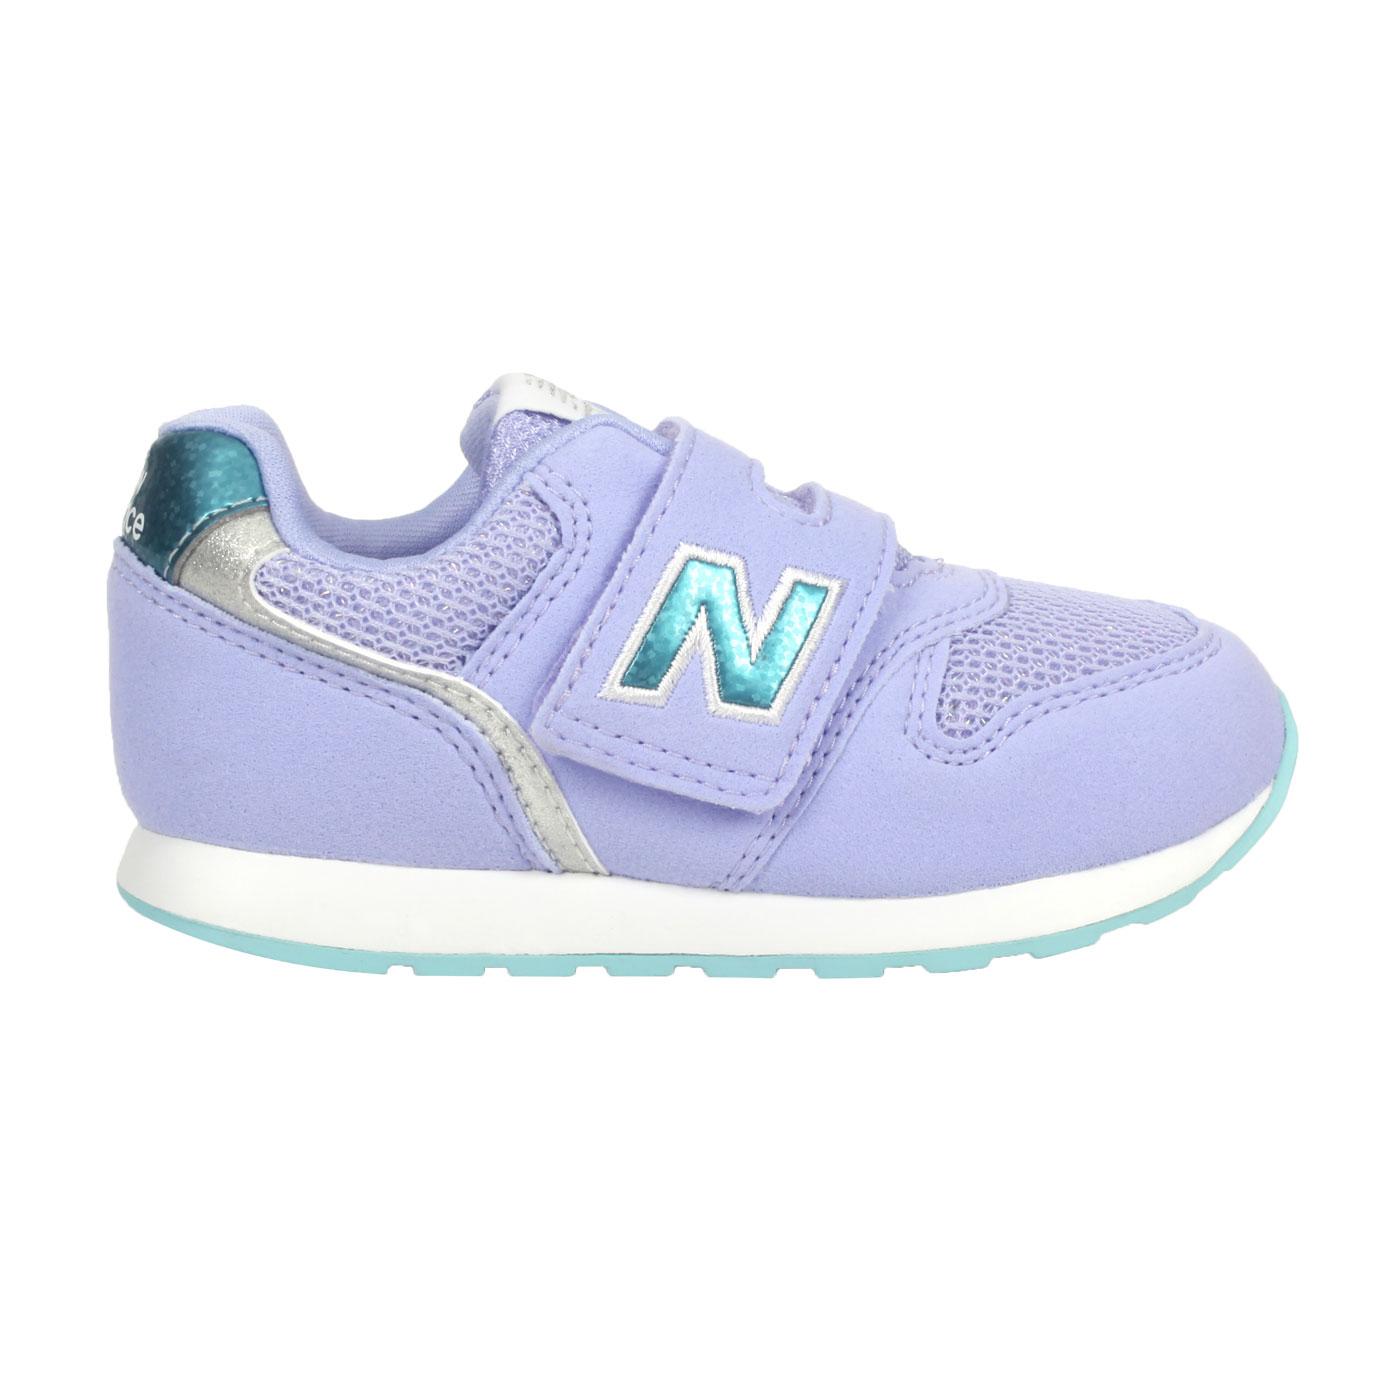 NEW BALANCE 小童休閒運動鞋-WIDE IZ996ULV - 紫藍